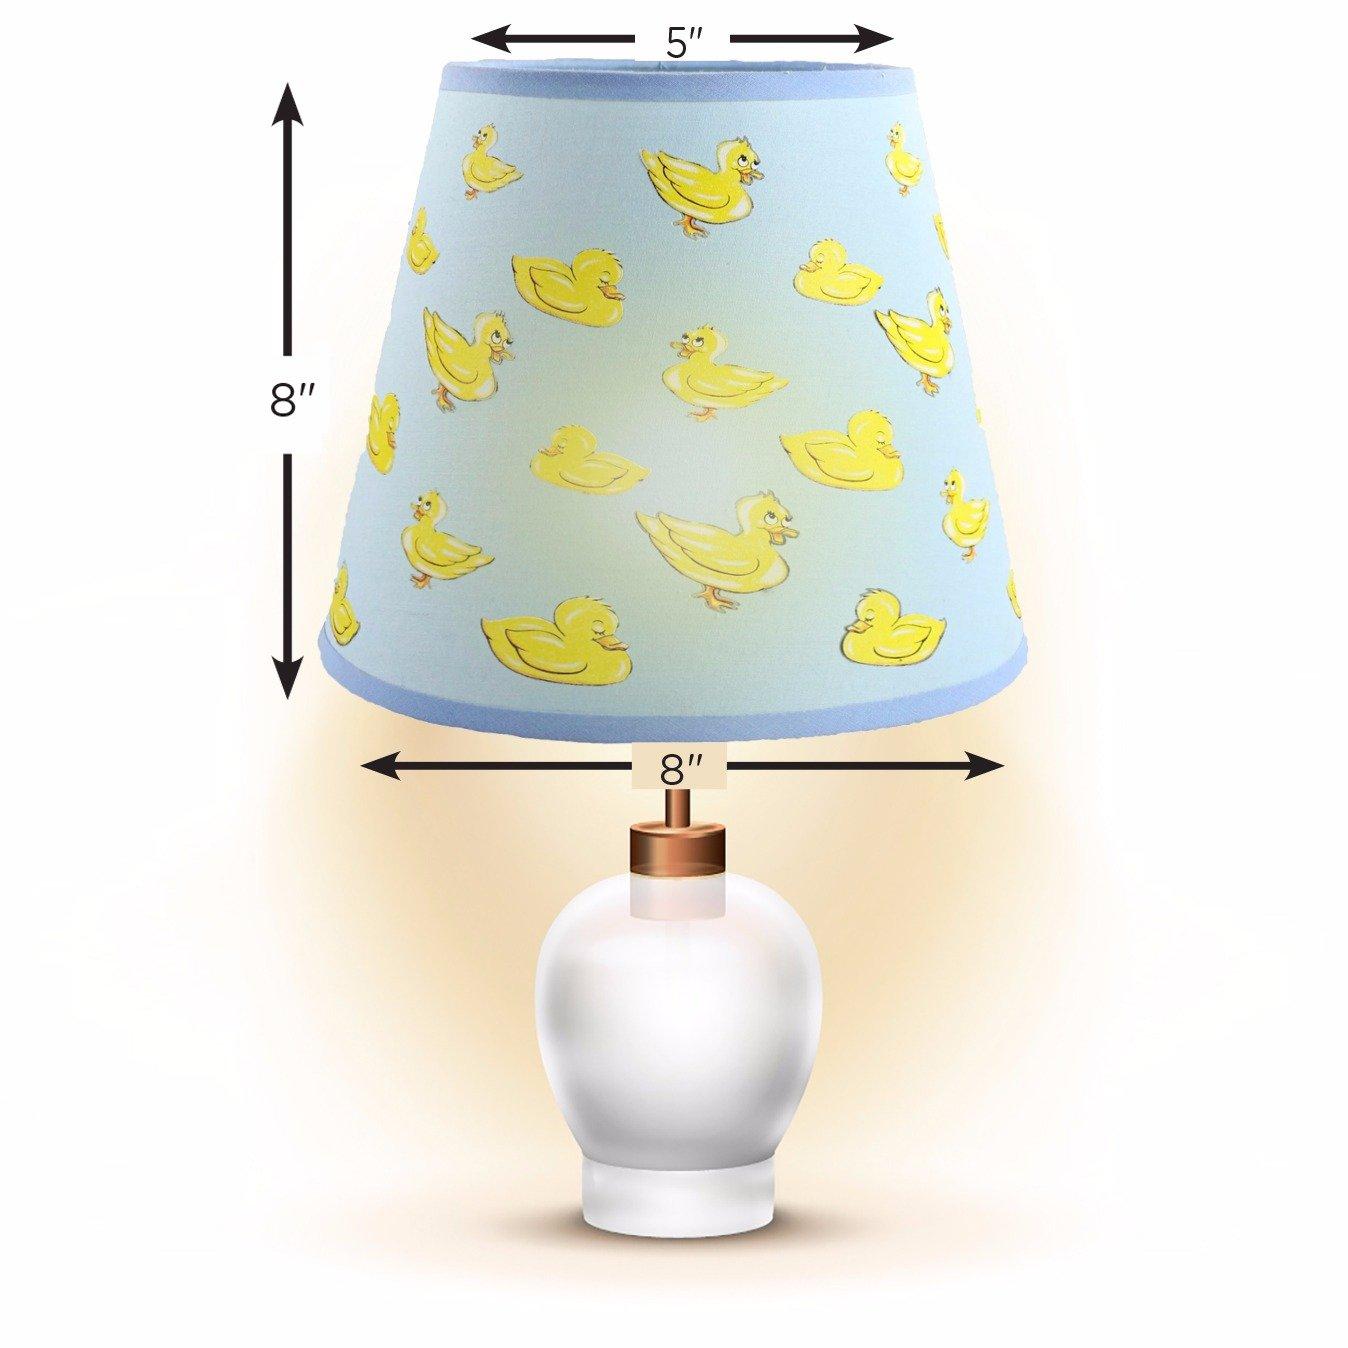 Childrens Dozing Ducks Lampshade for Boys /& Girls Nursery SooRoo Kids Duck Lamp Shade Pink Playroom Bedroom Pink or Blue Classroom /& More